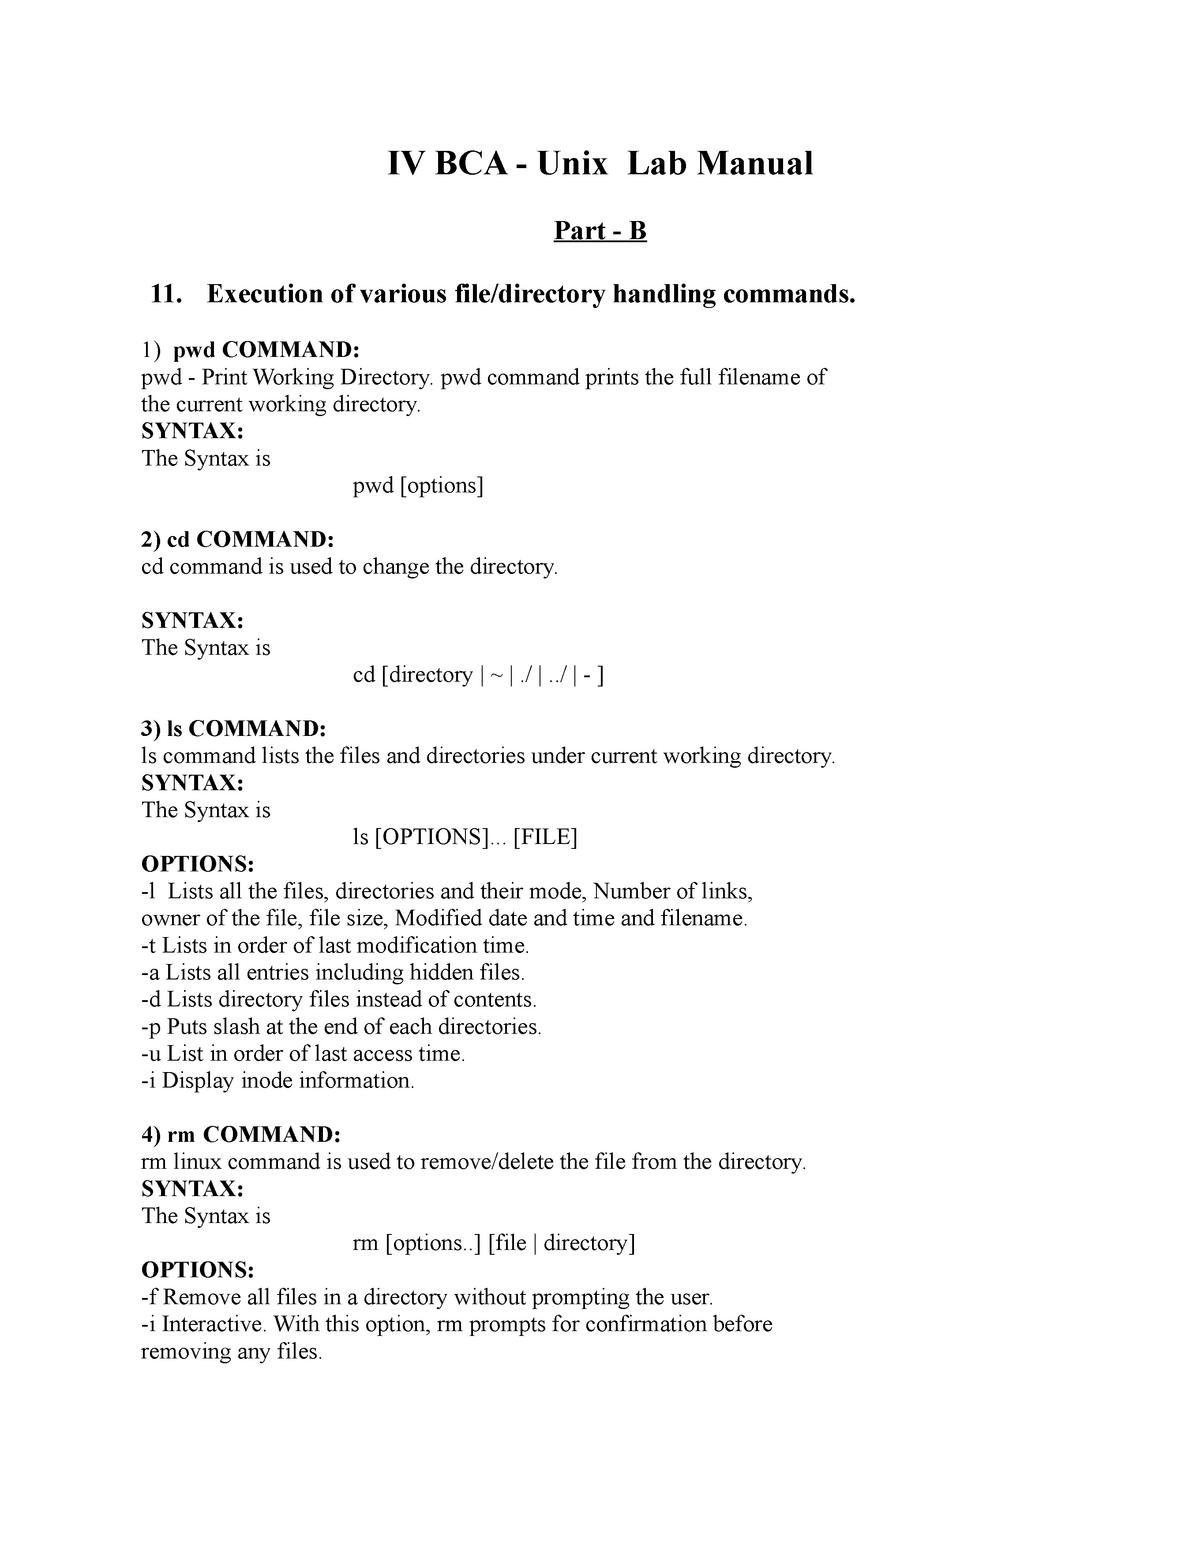 Unix Lab Manual BCA Part B - UNIX Programming BCA406 - StuDocu